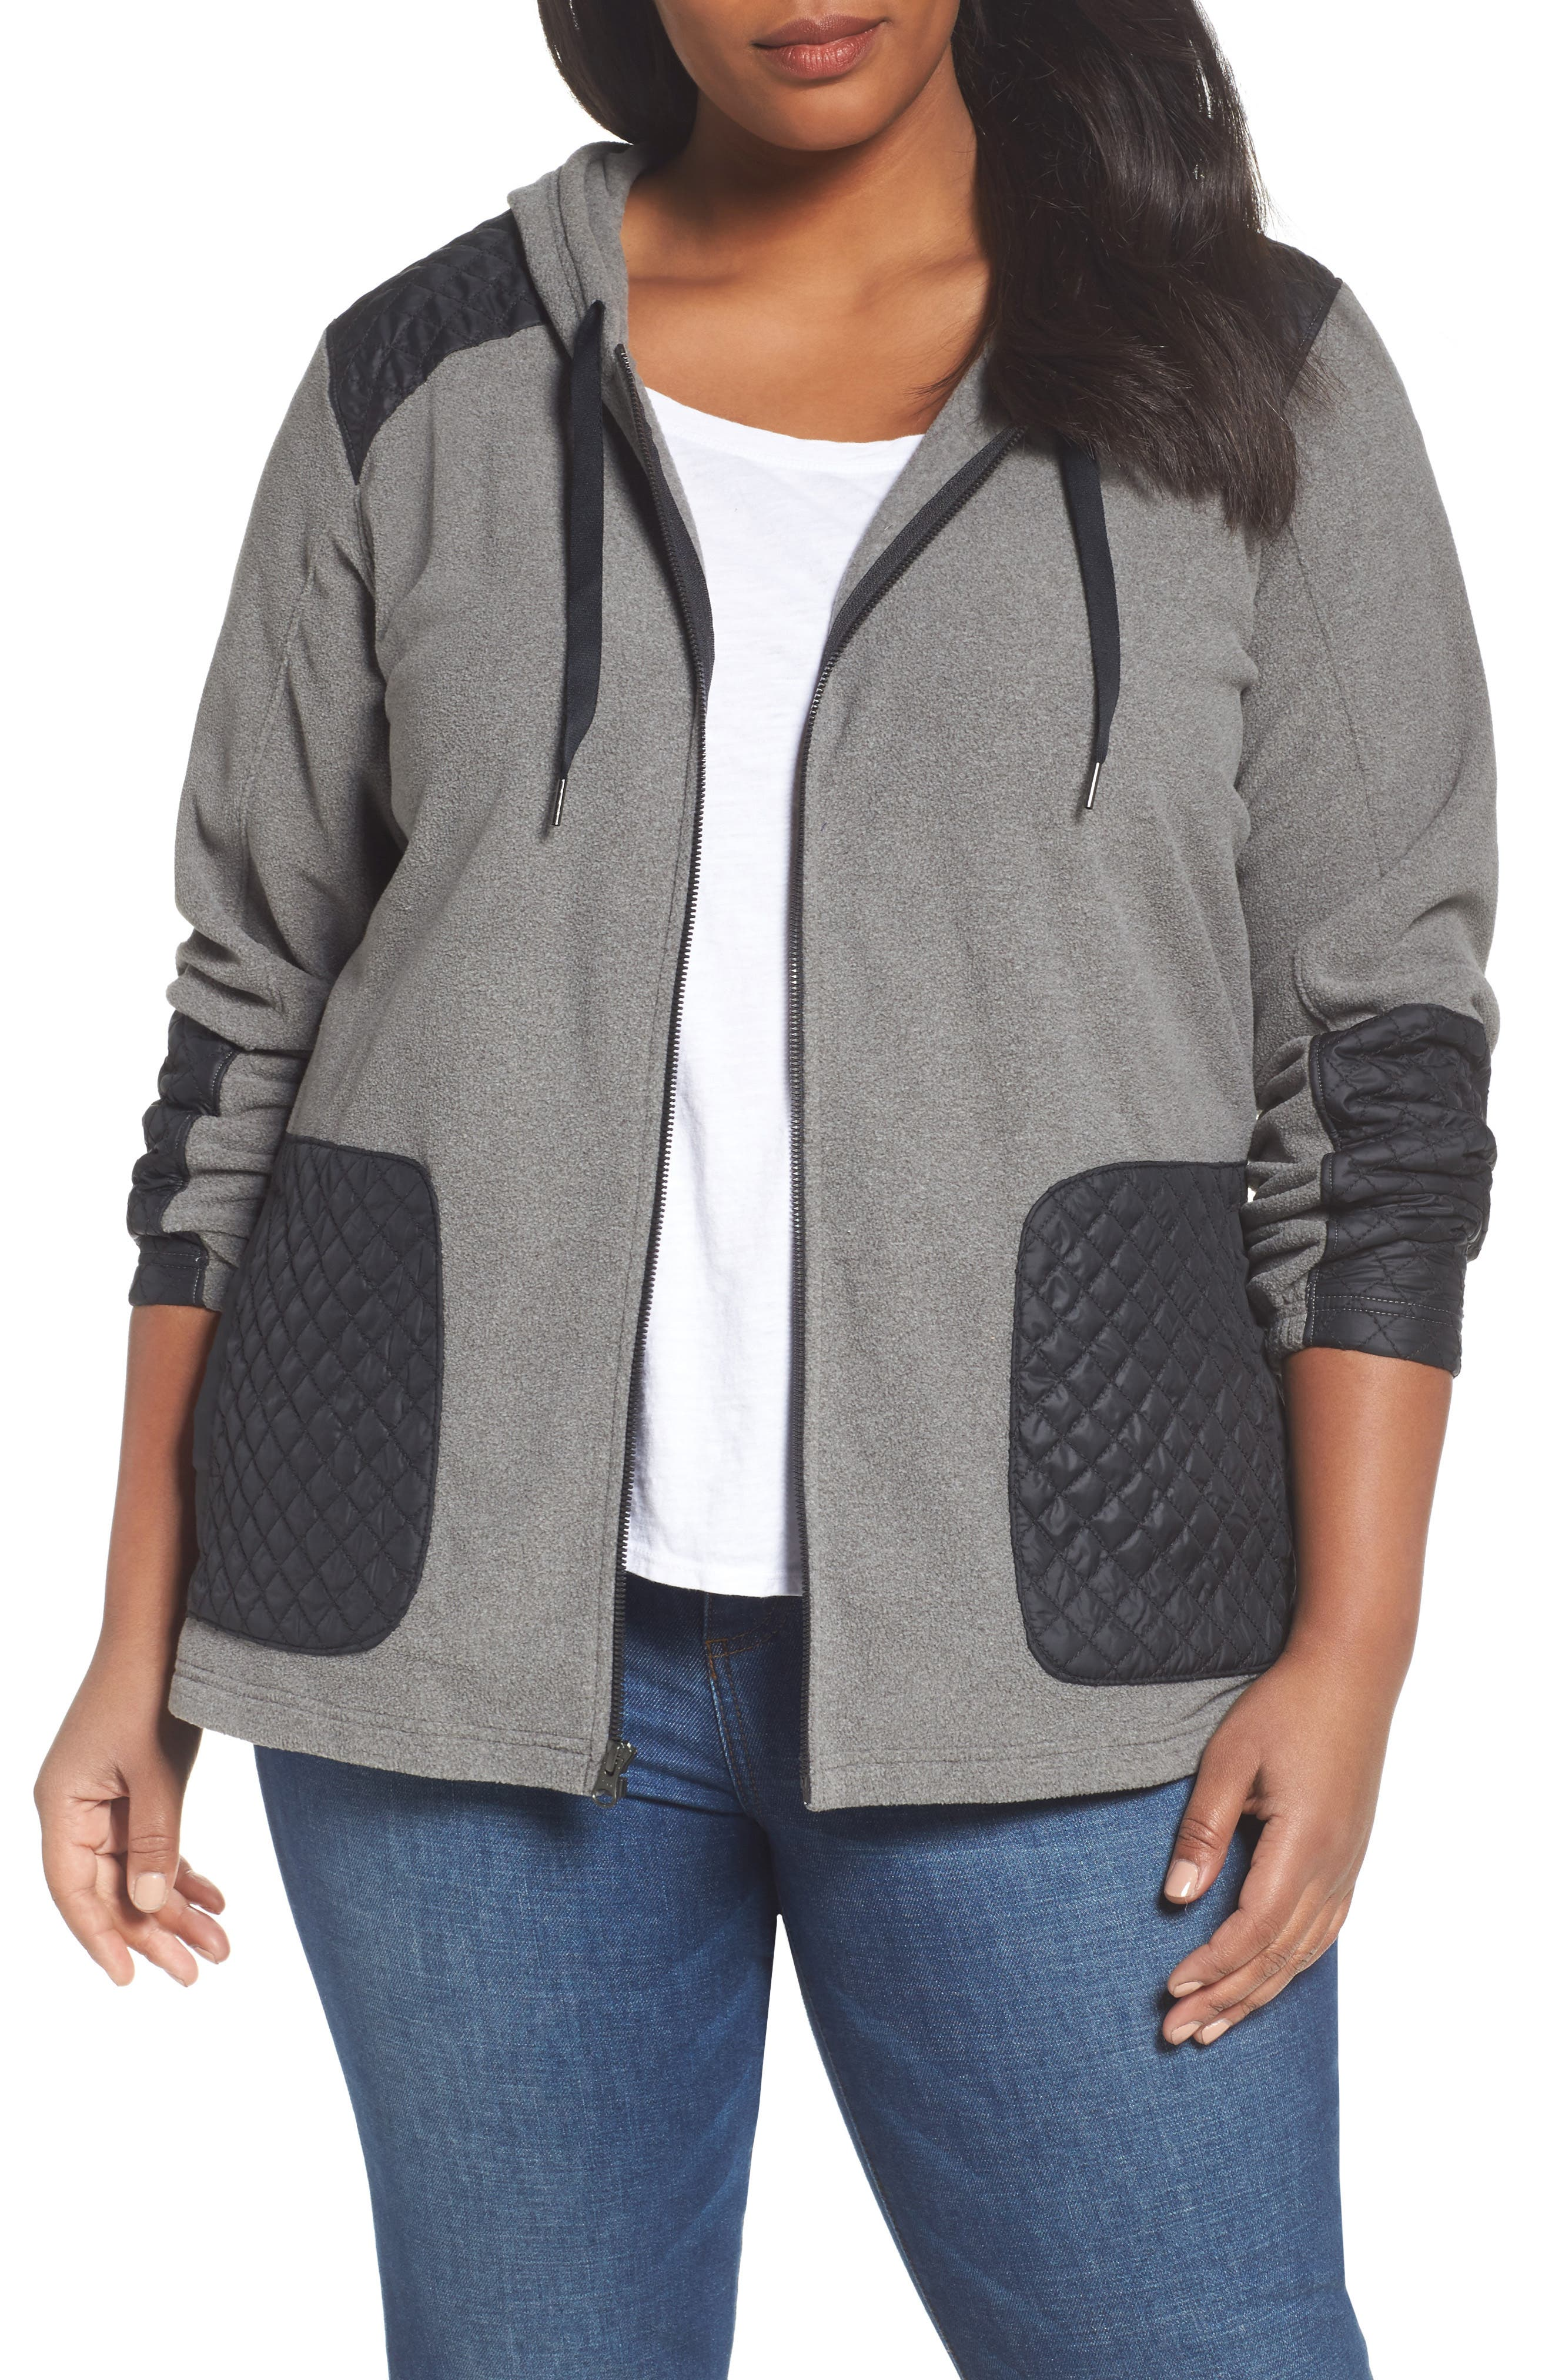 Alternate Image 1 Selected - Columbia Warm Up Hooded Fleece Jacket (Plus Size)